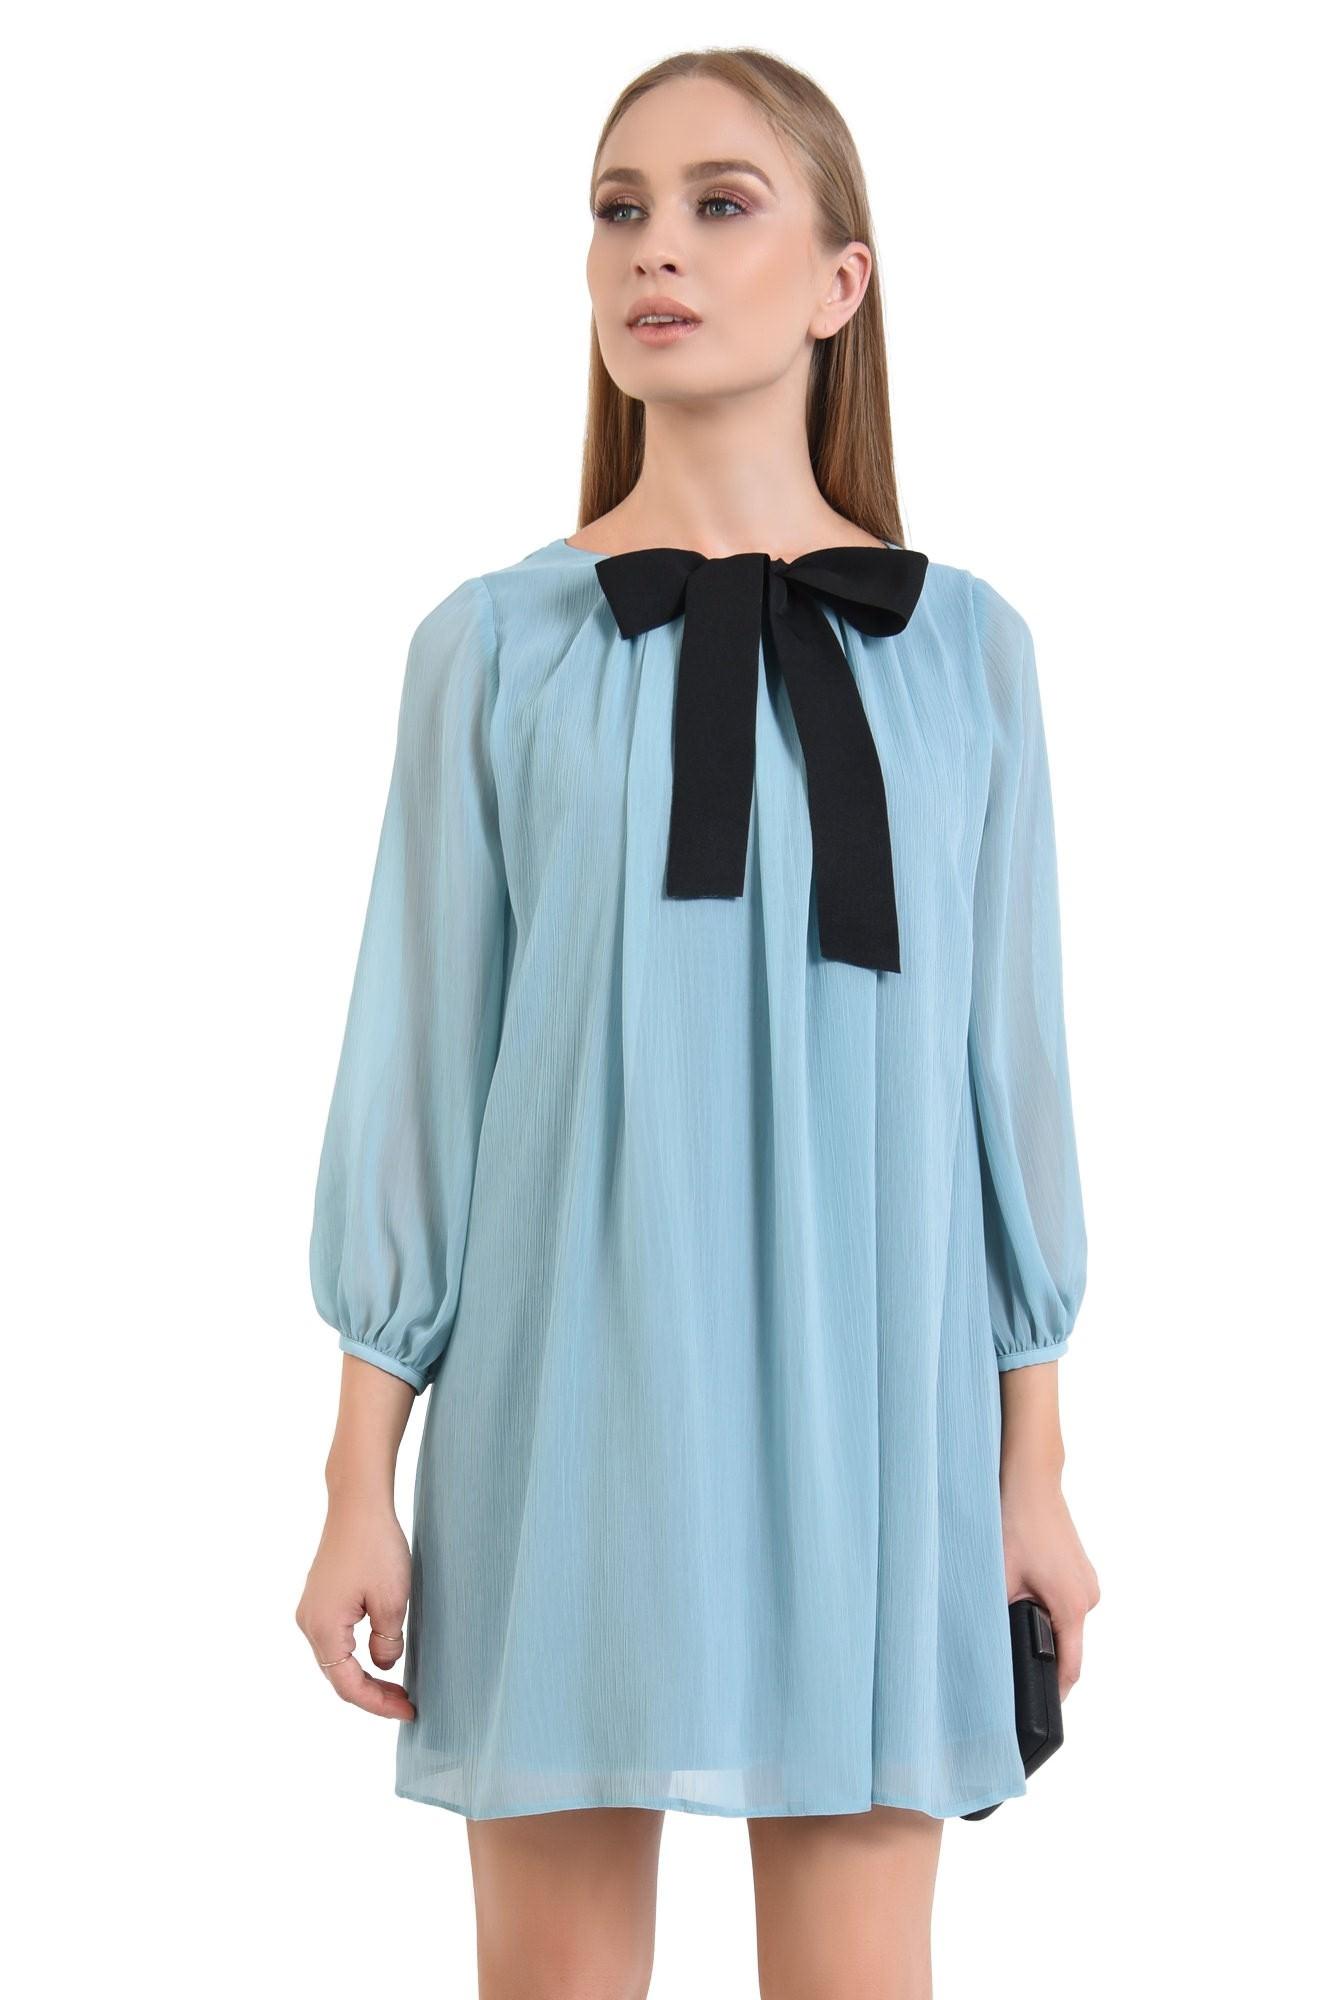 rochie eleganta, bleu, rips, negru, contrast